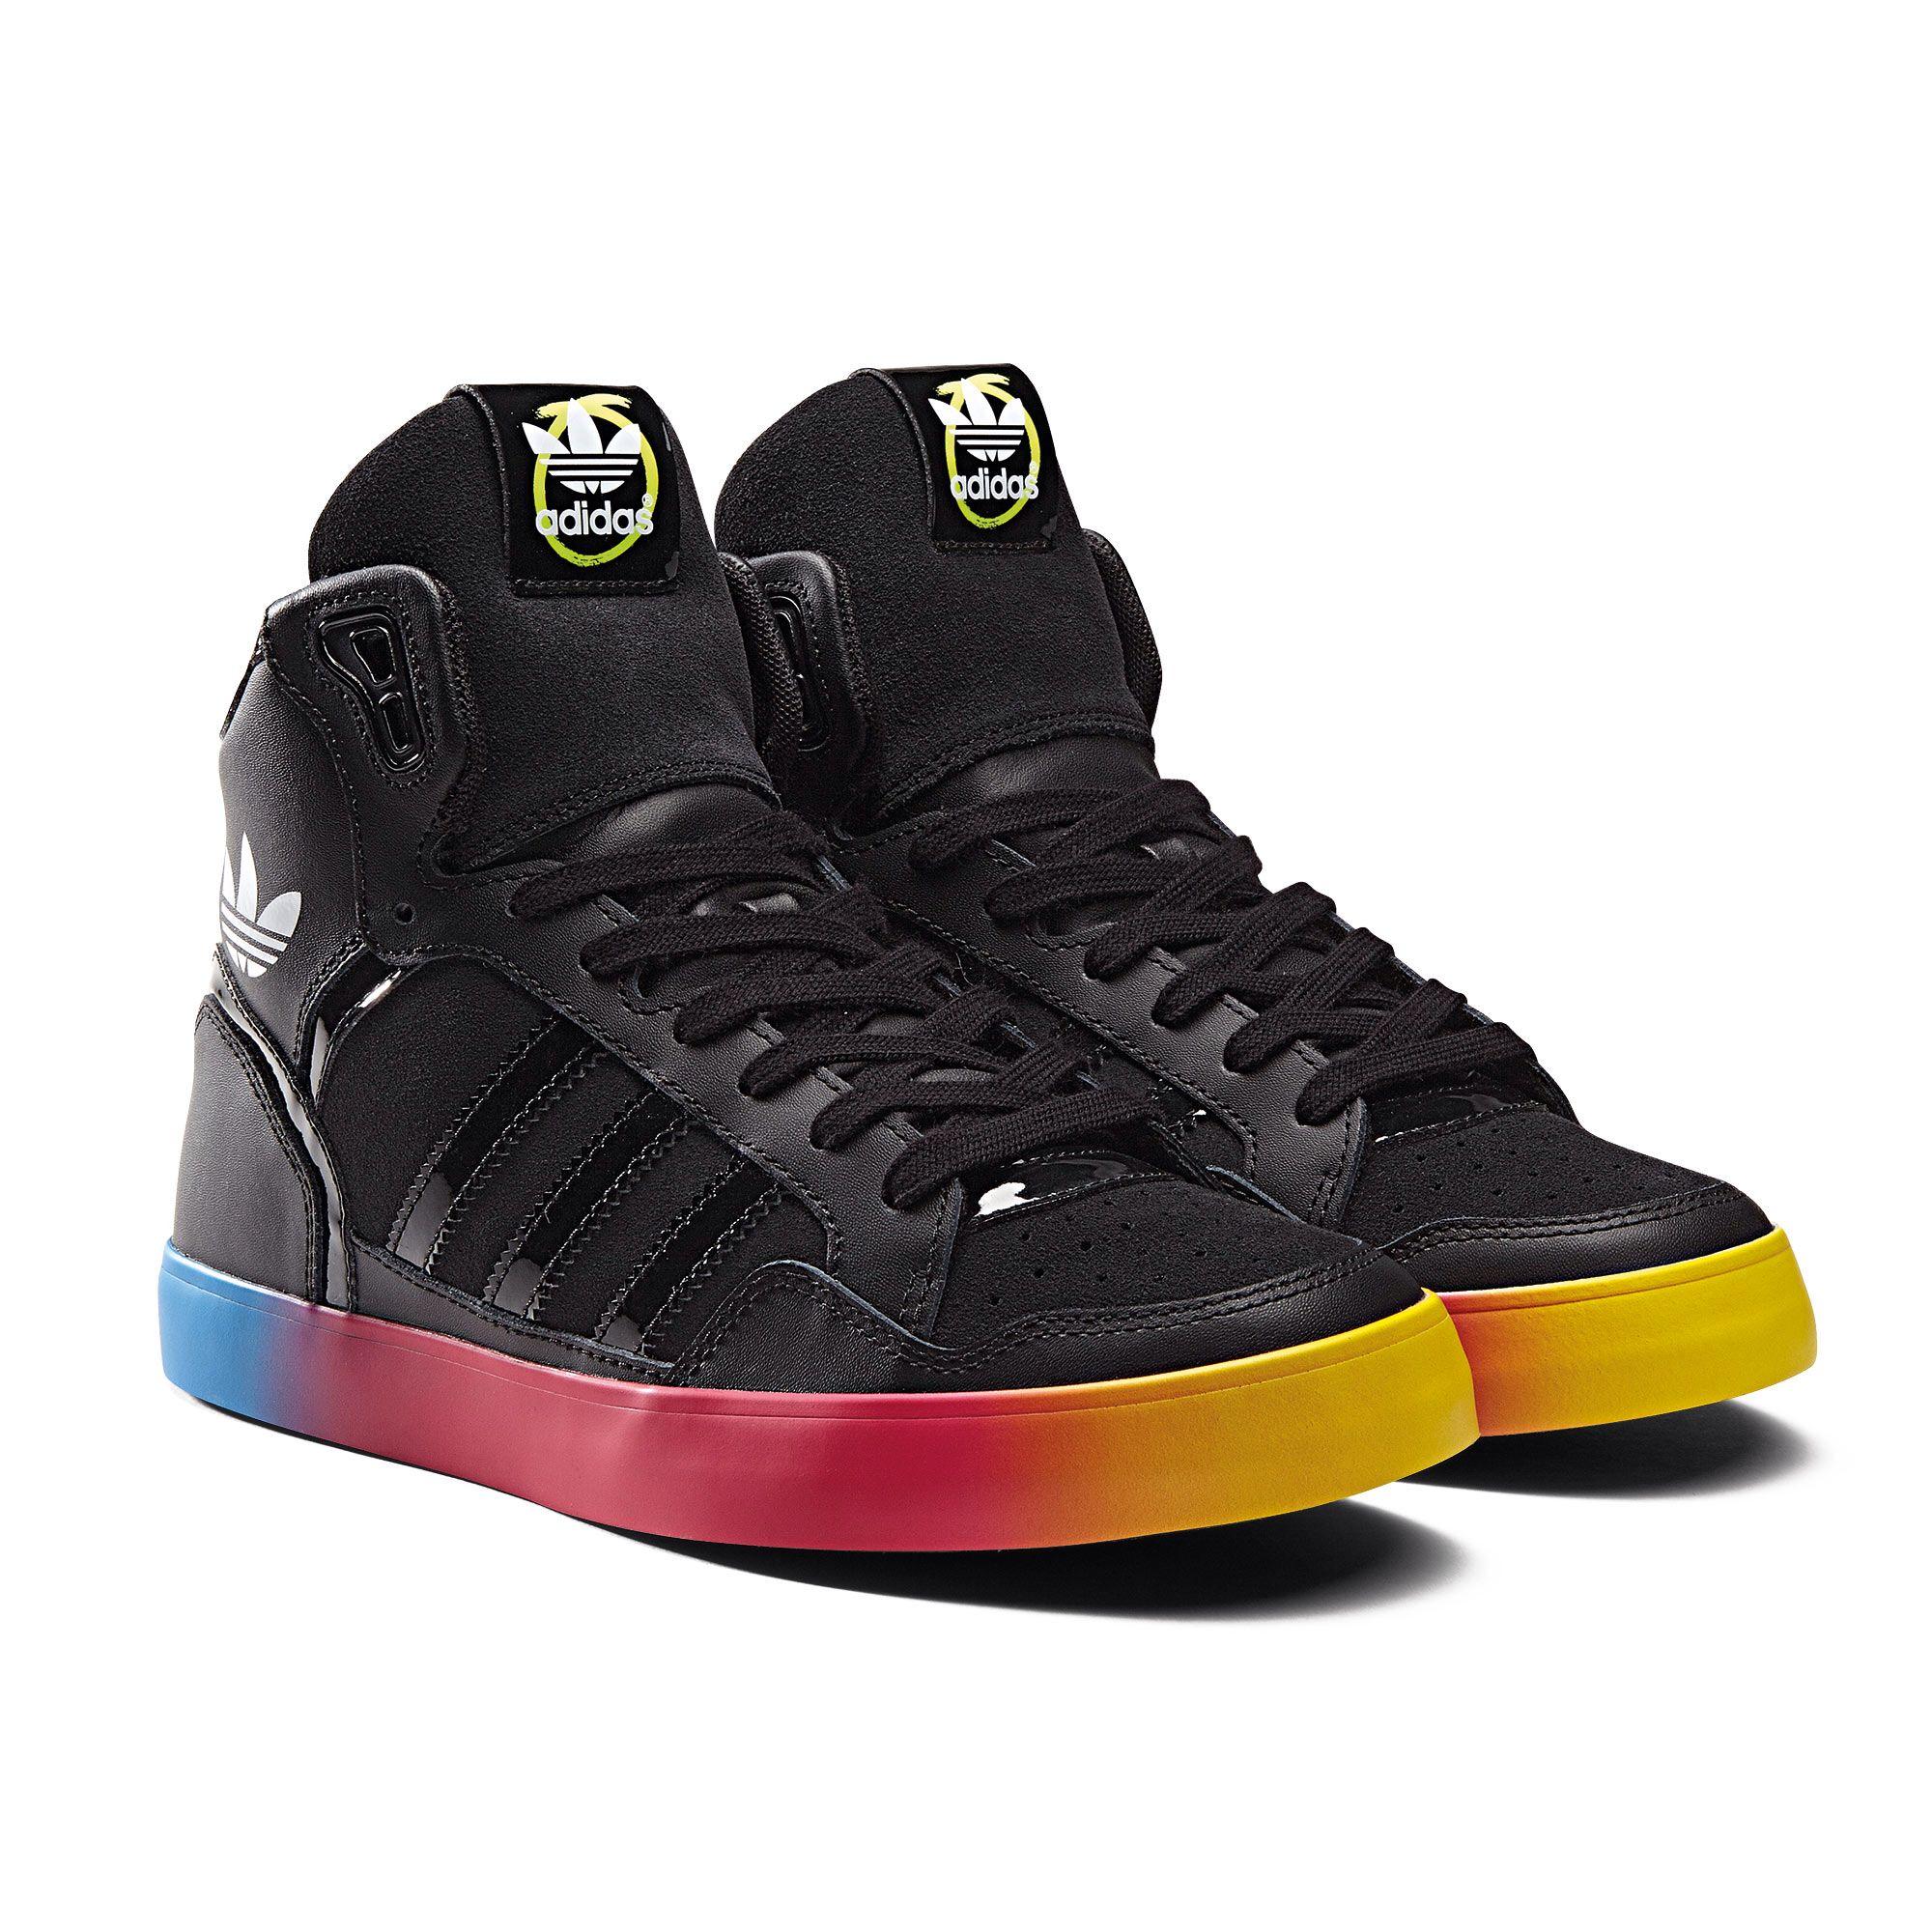 Rita Ora for Adidas!! Live them!